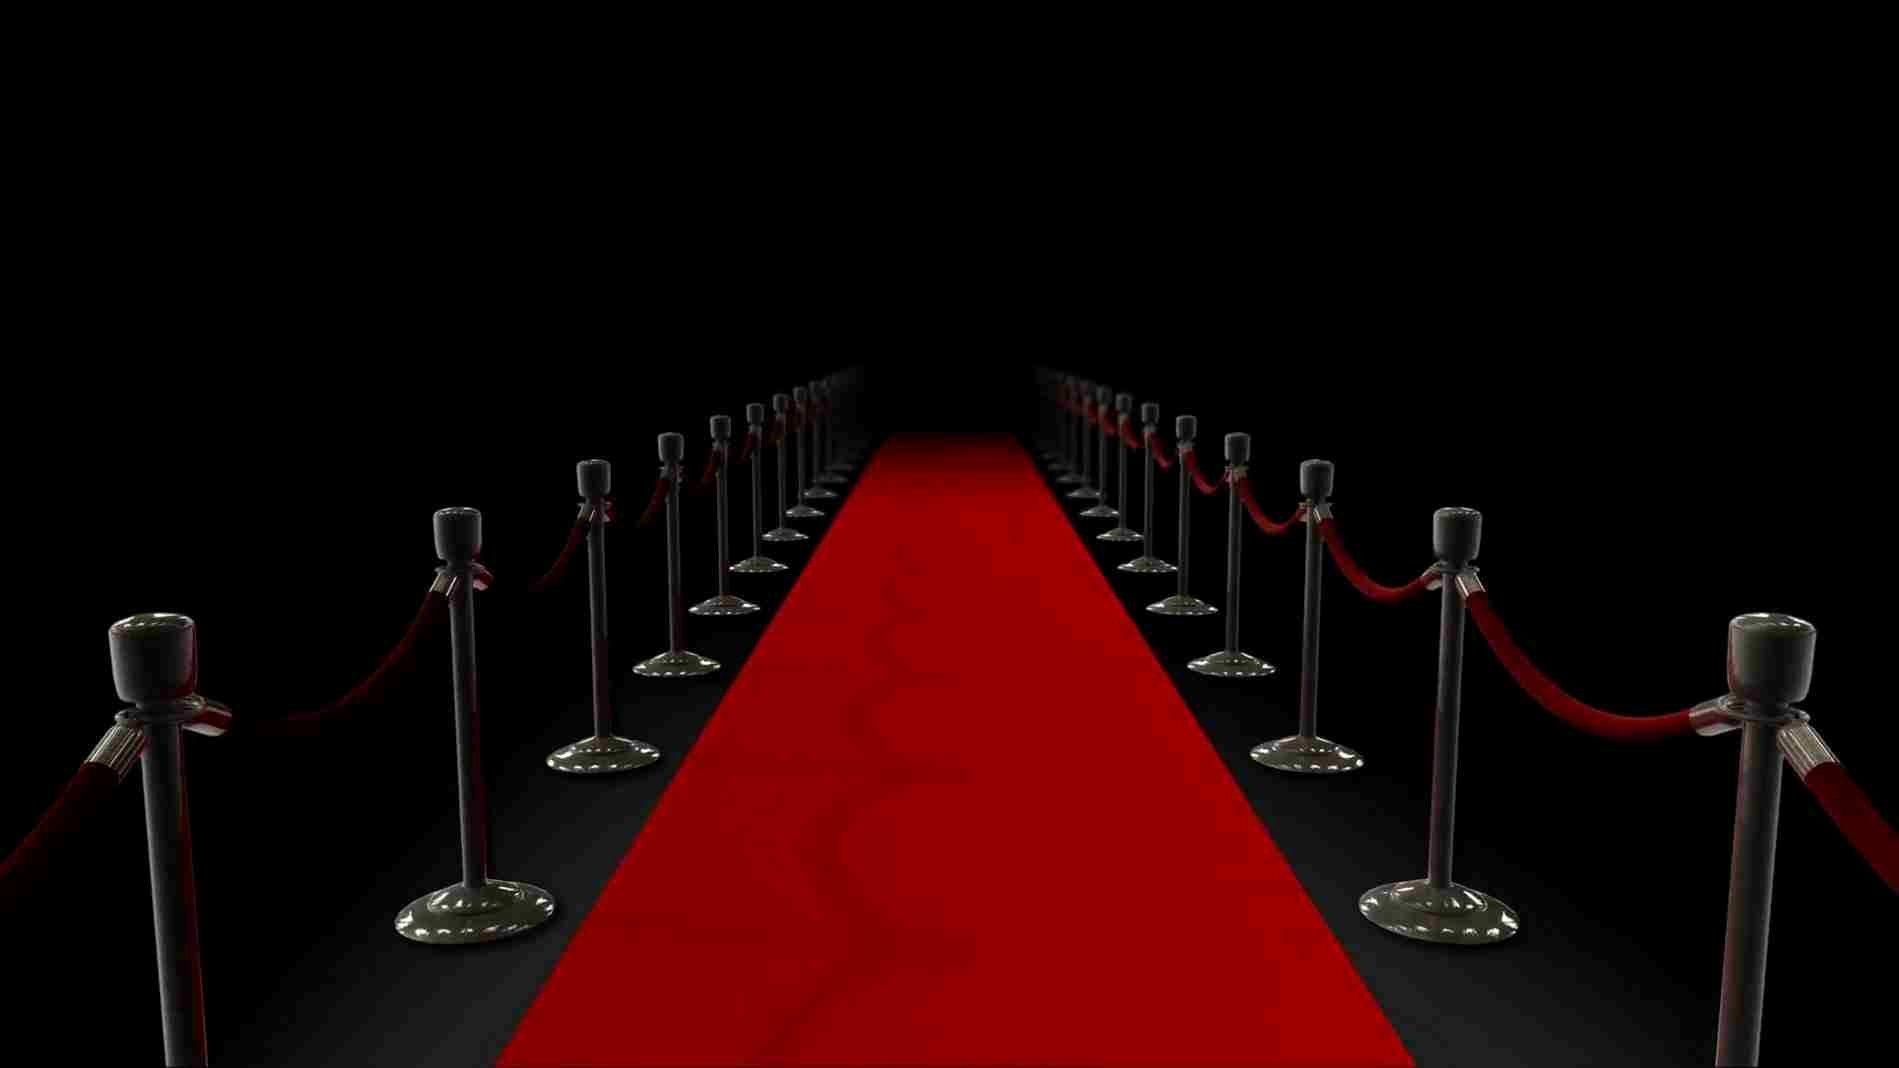 Red Carpet Backdrop Template Best Of Oscars Red Carpet Backdrop